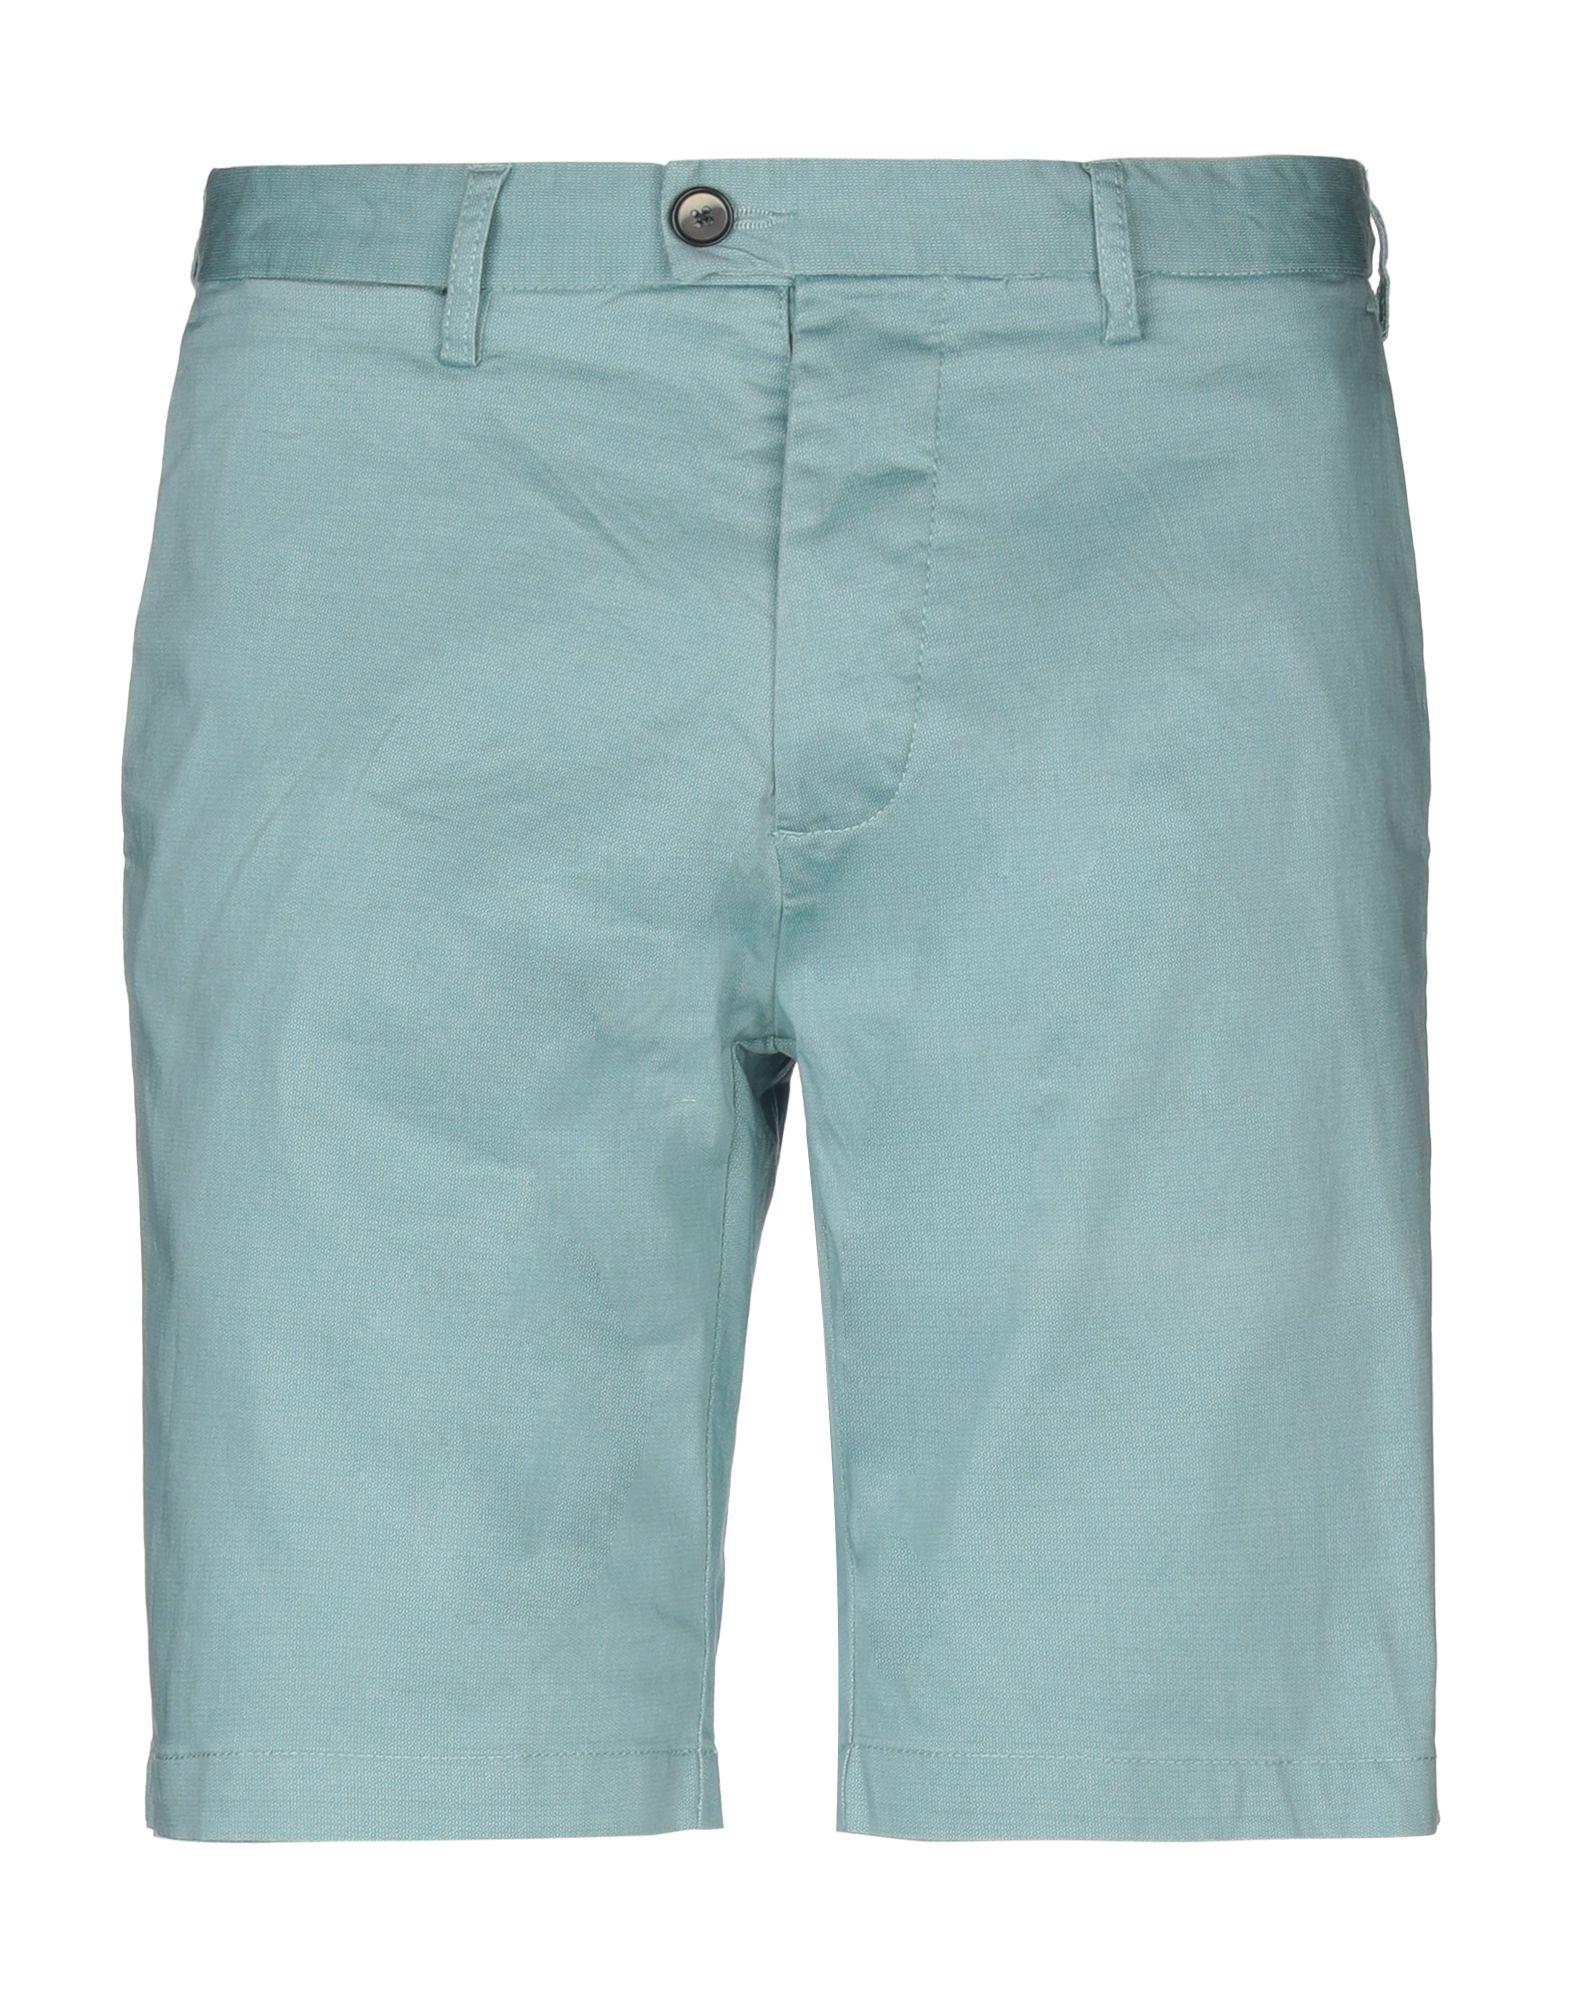 Shorts & Bermuda Alley Docks 963 herren - 13269234NR